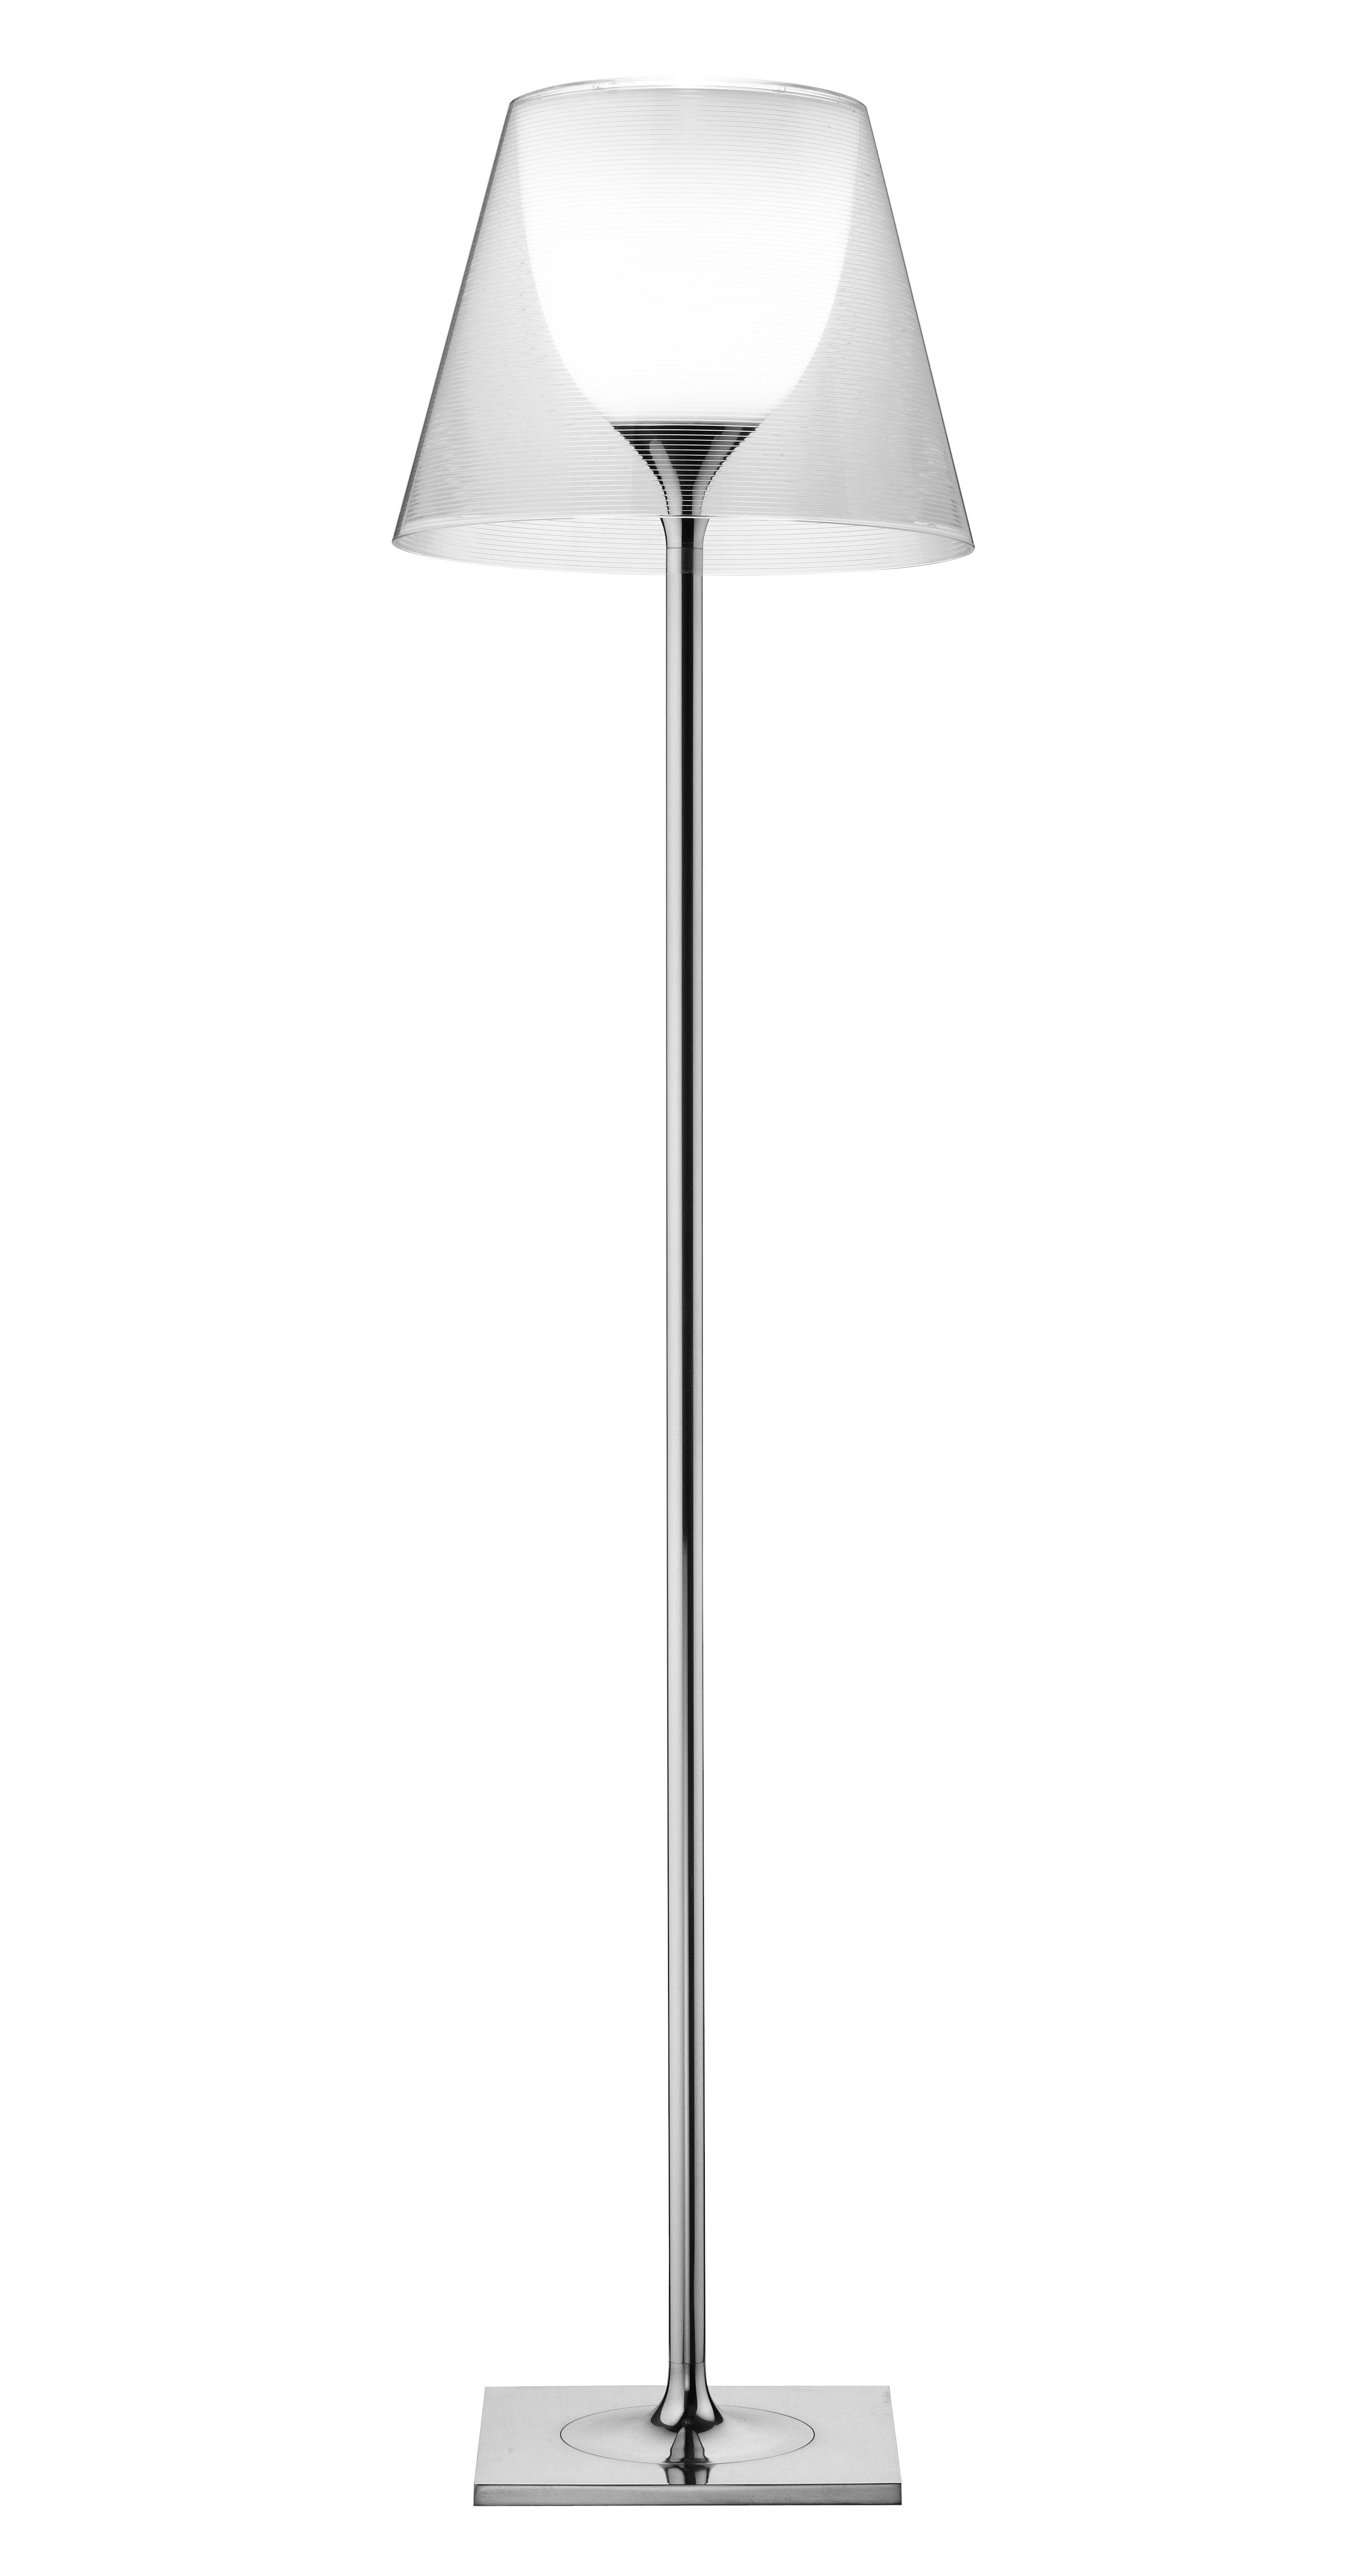 Illuminazione - Lampade da terra - Lampada a stelo K Tribe F2 - H 162 cm di Flos - Trasparente - Alluminio lucido, PMMA